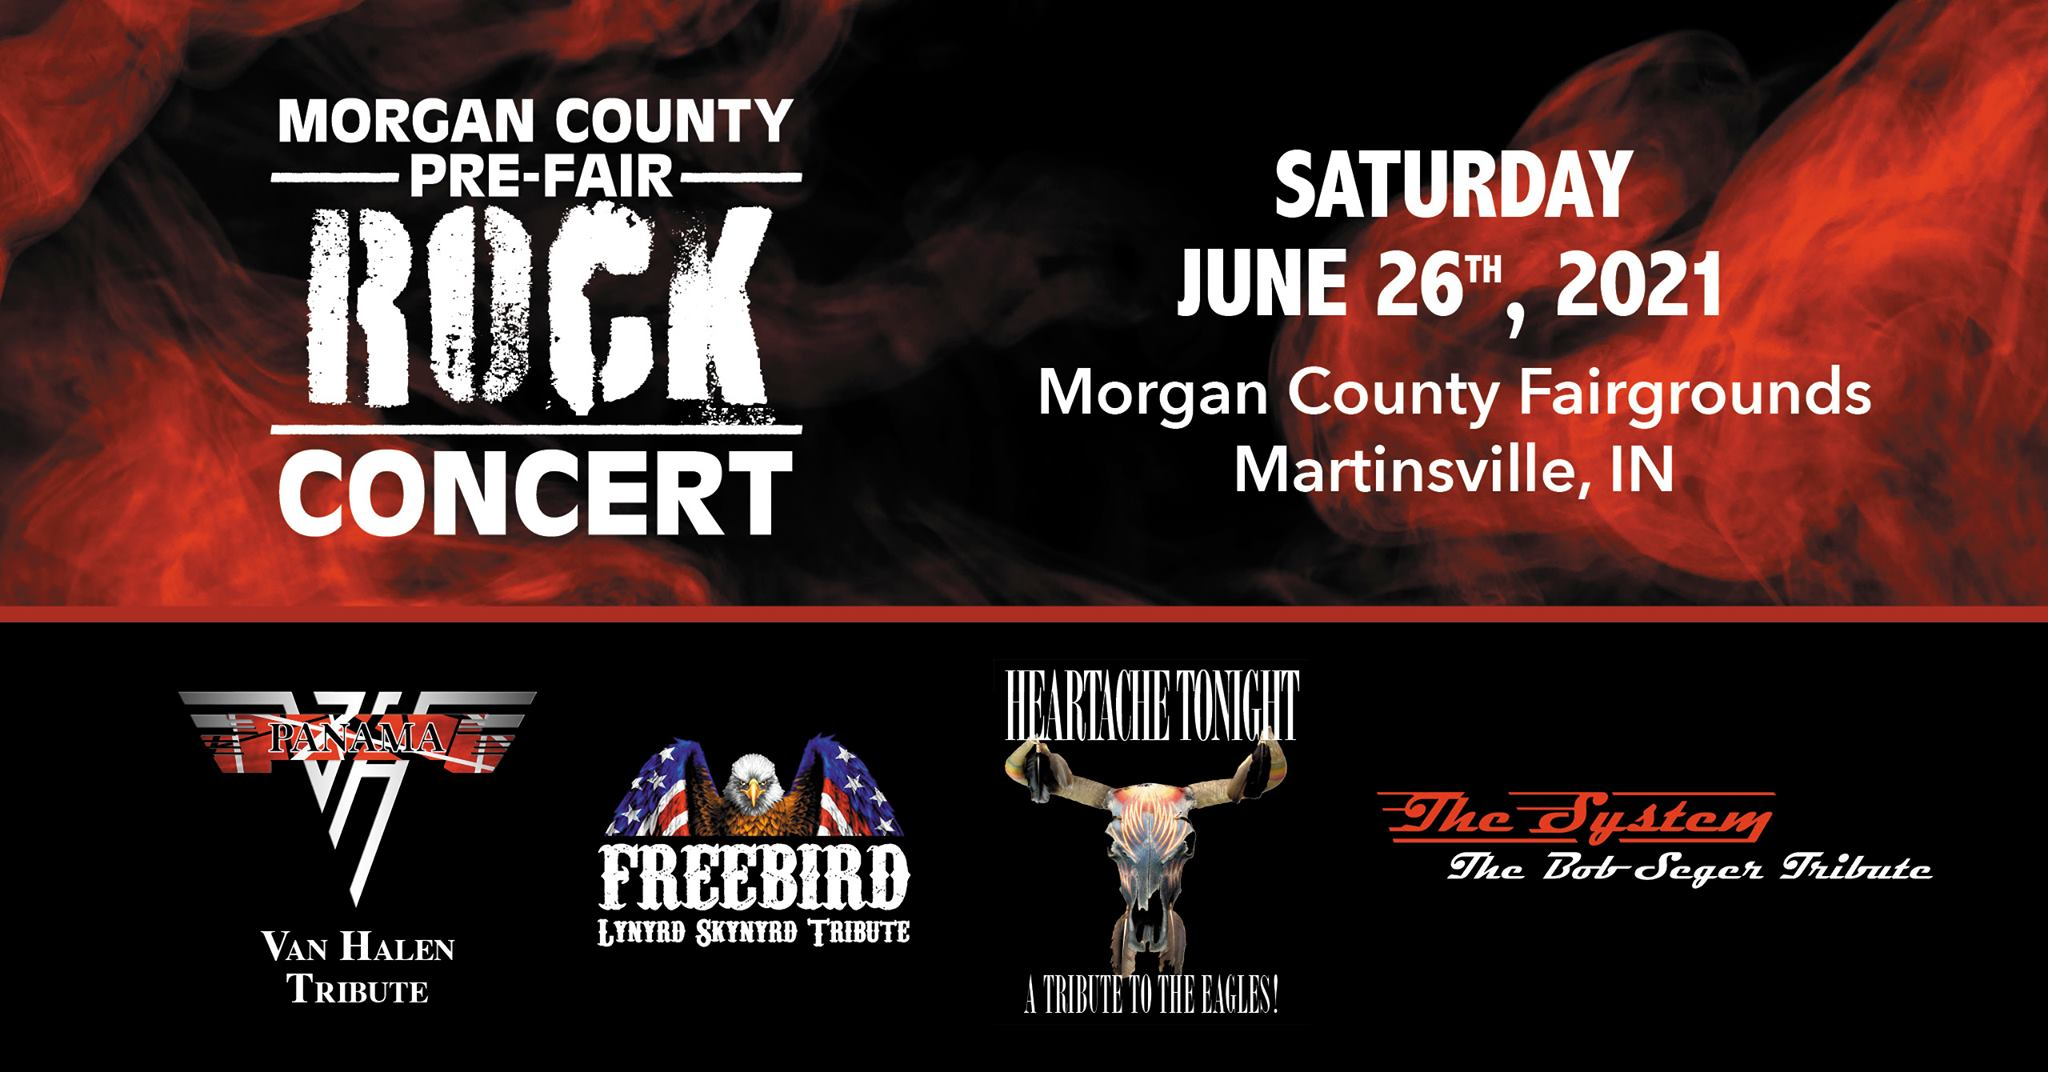 morgan county pre-fair rock concert